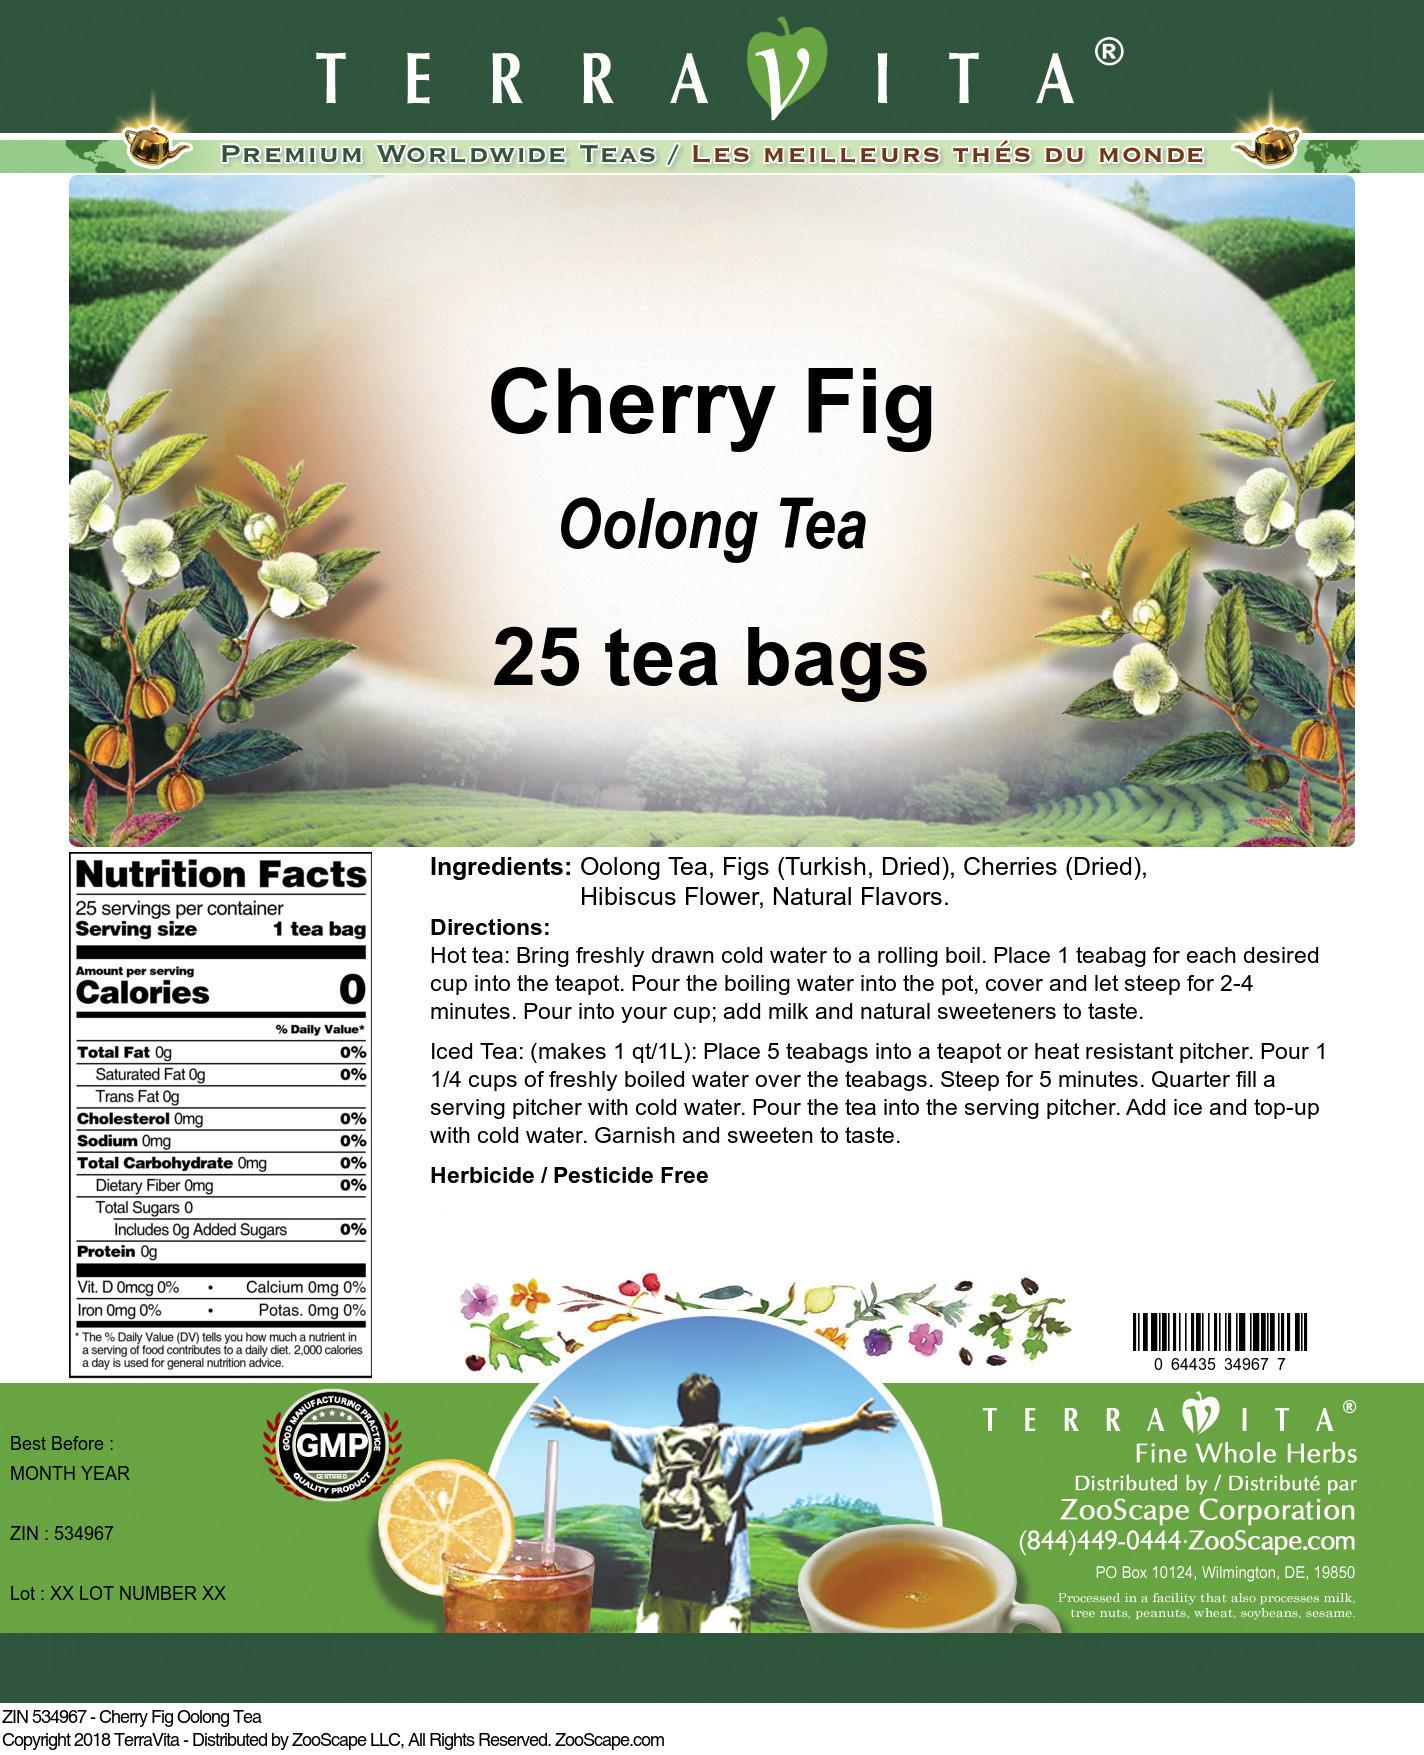 Cherry Fig Oolong Tea